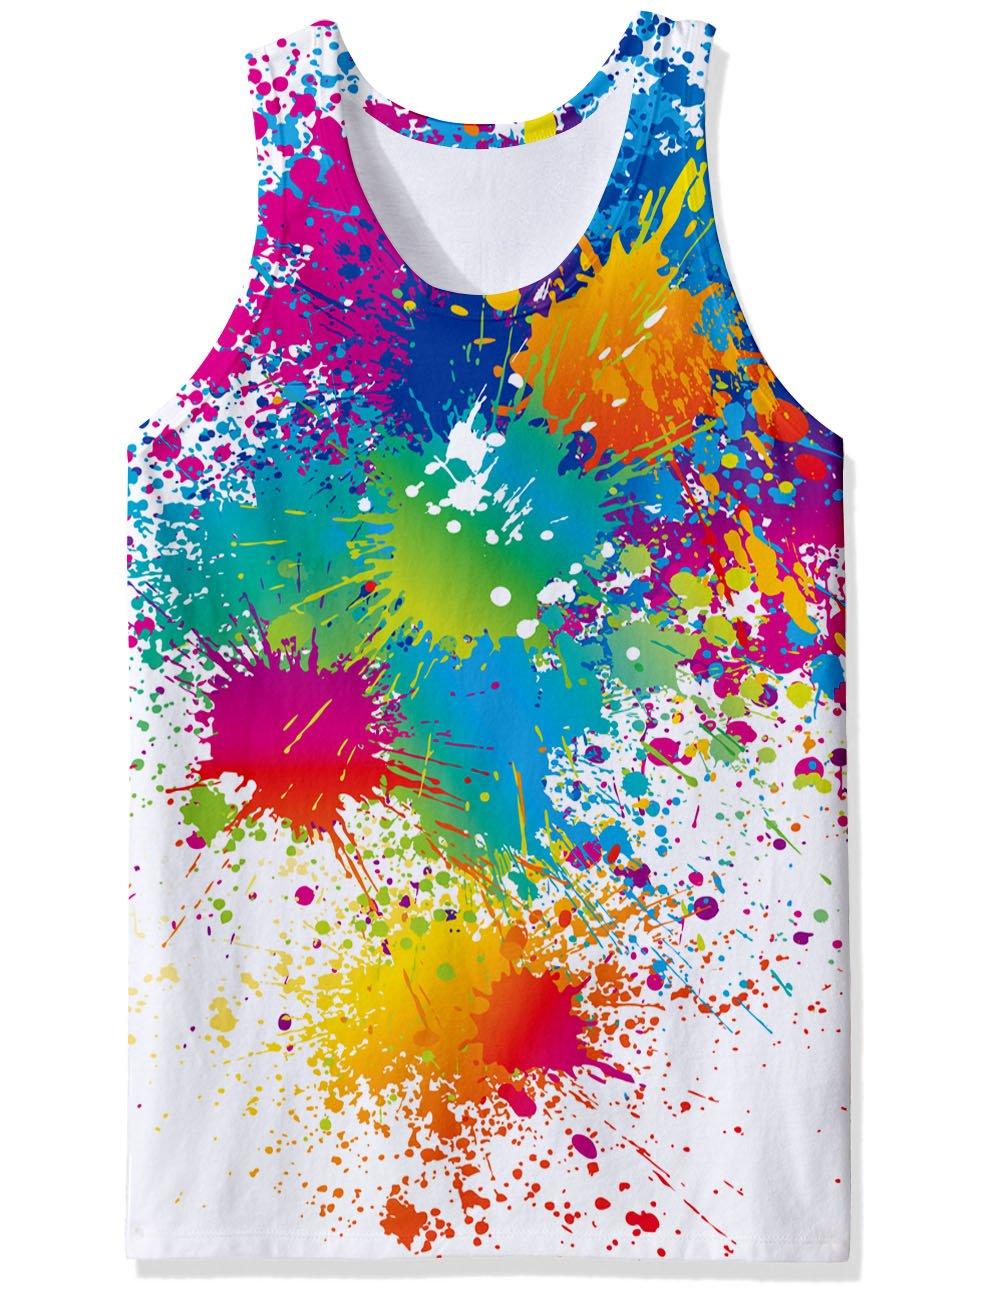 RAISEVERN 3D Pintura Colorida impresión patrón Divertido Realista fobric Gimnasio Camisetas para Hombres Grandes